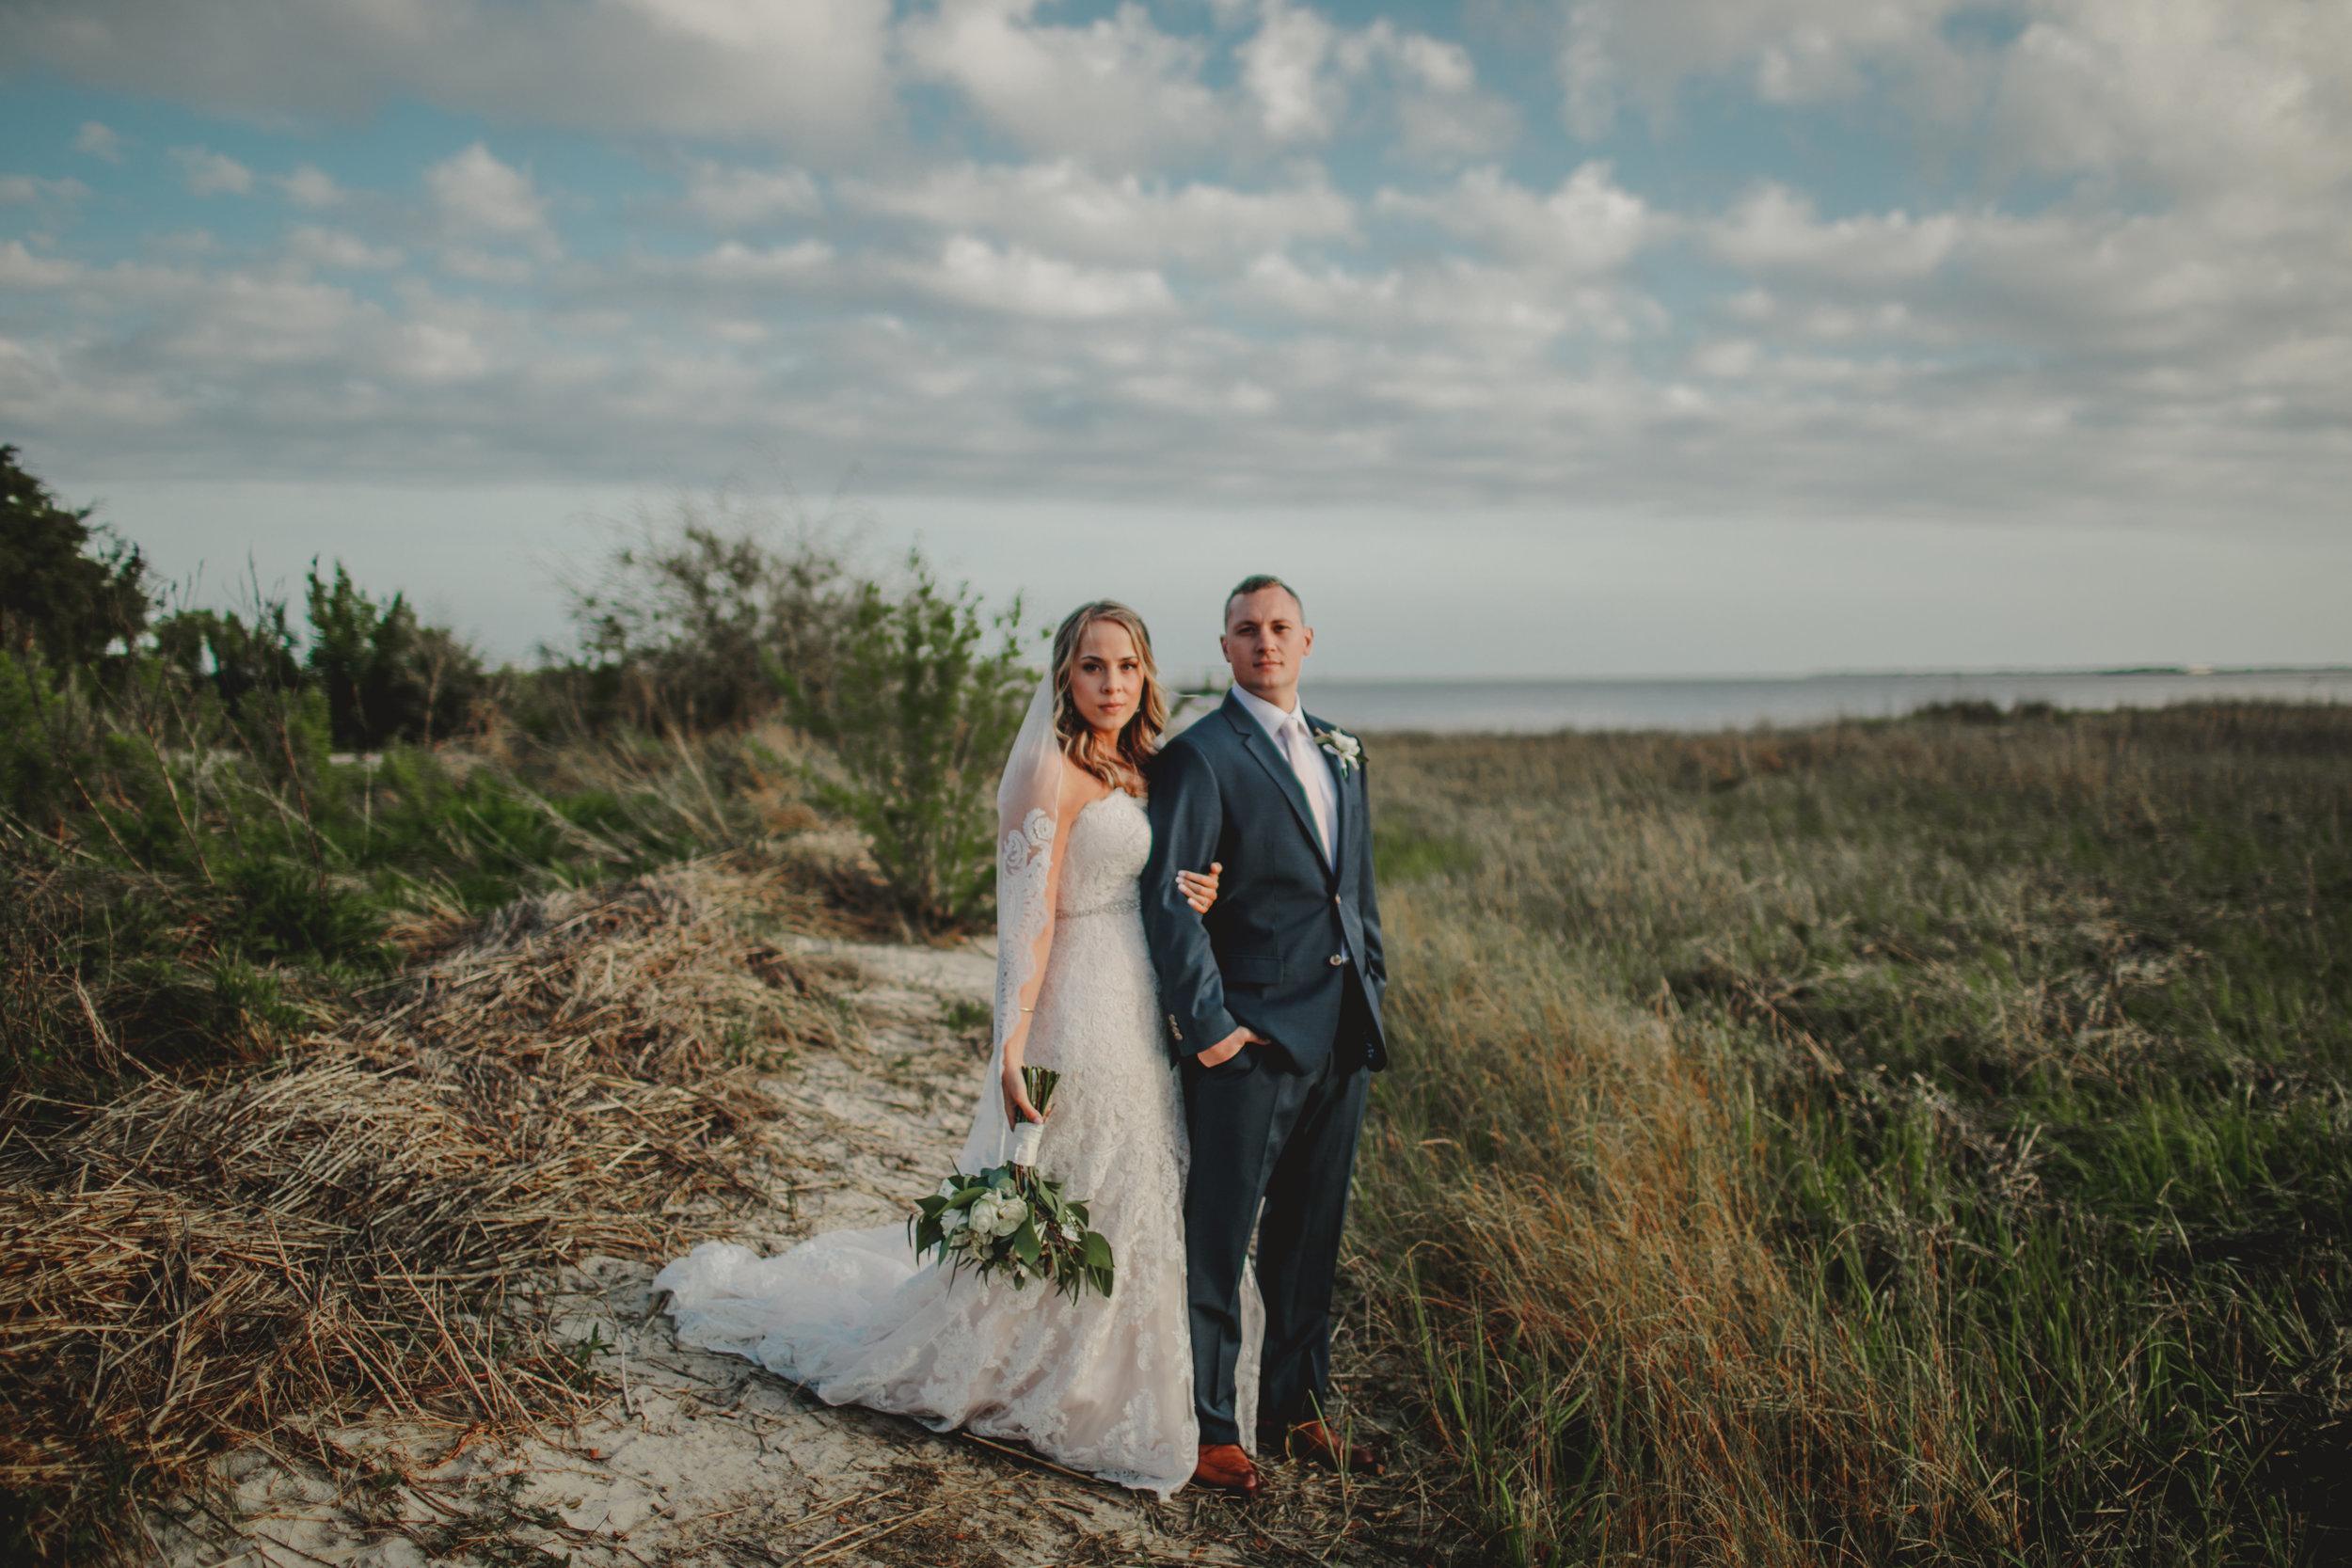 Charelston_SC_Wedding_Photographer.jpg